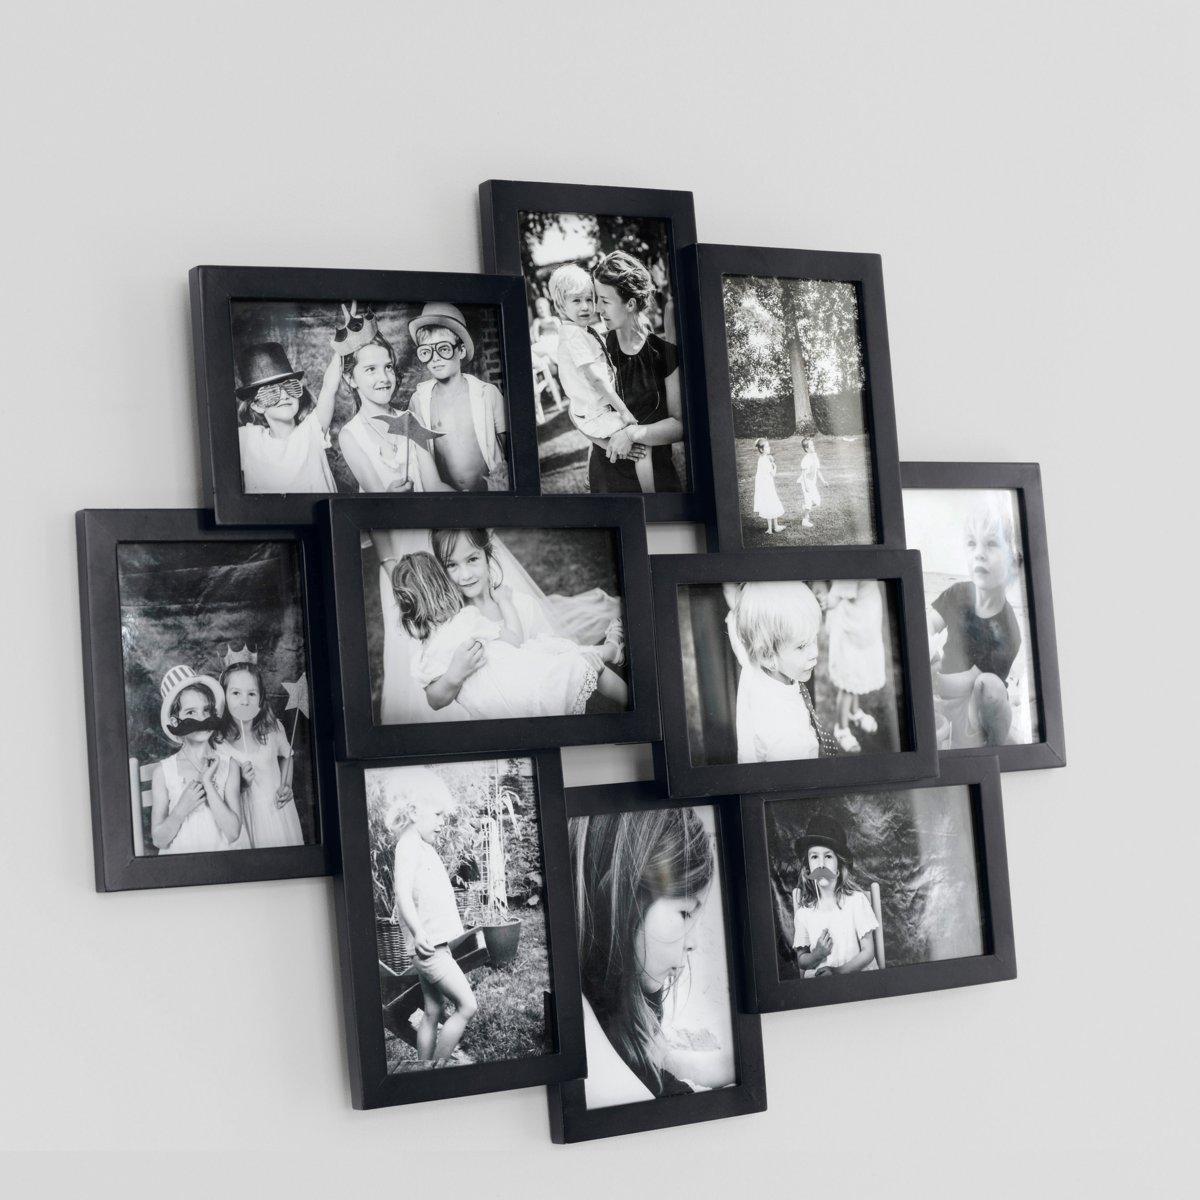 Рамка настенная для 10 фотографий, Iva от La Redoute